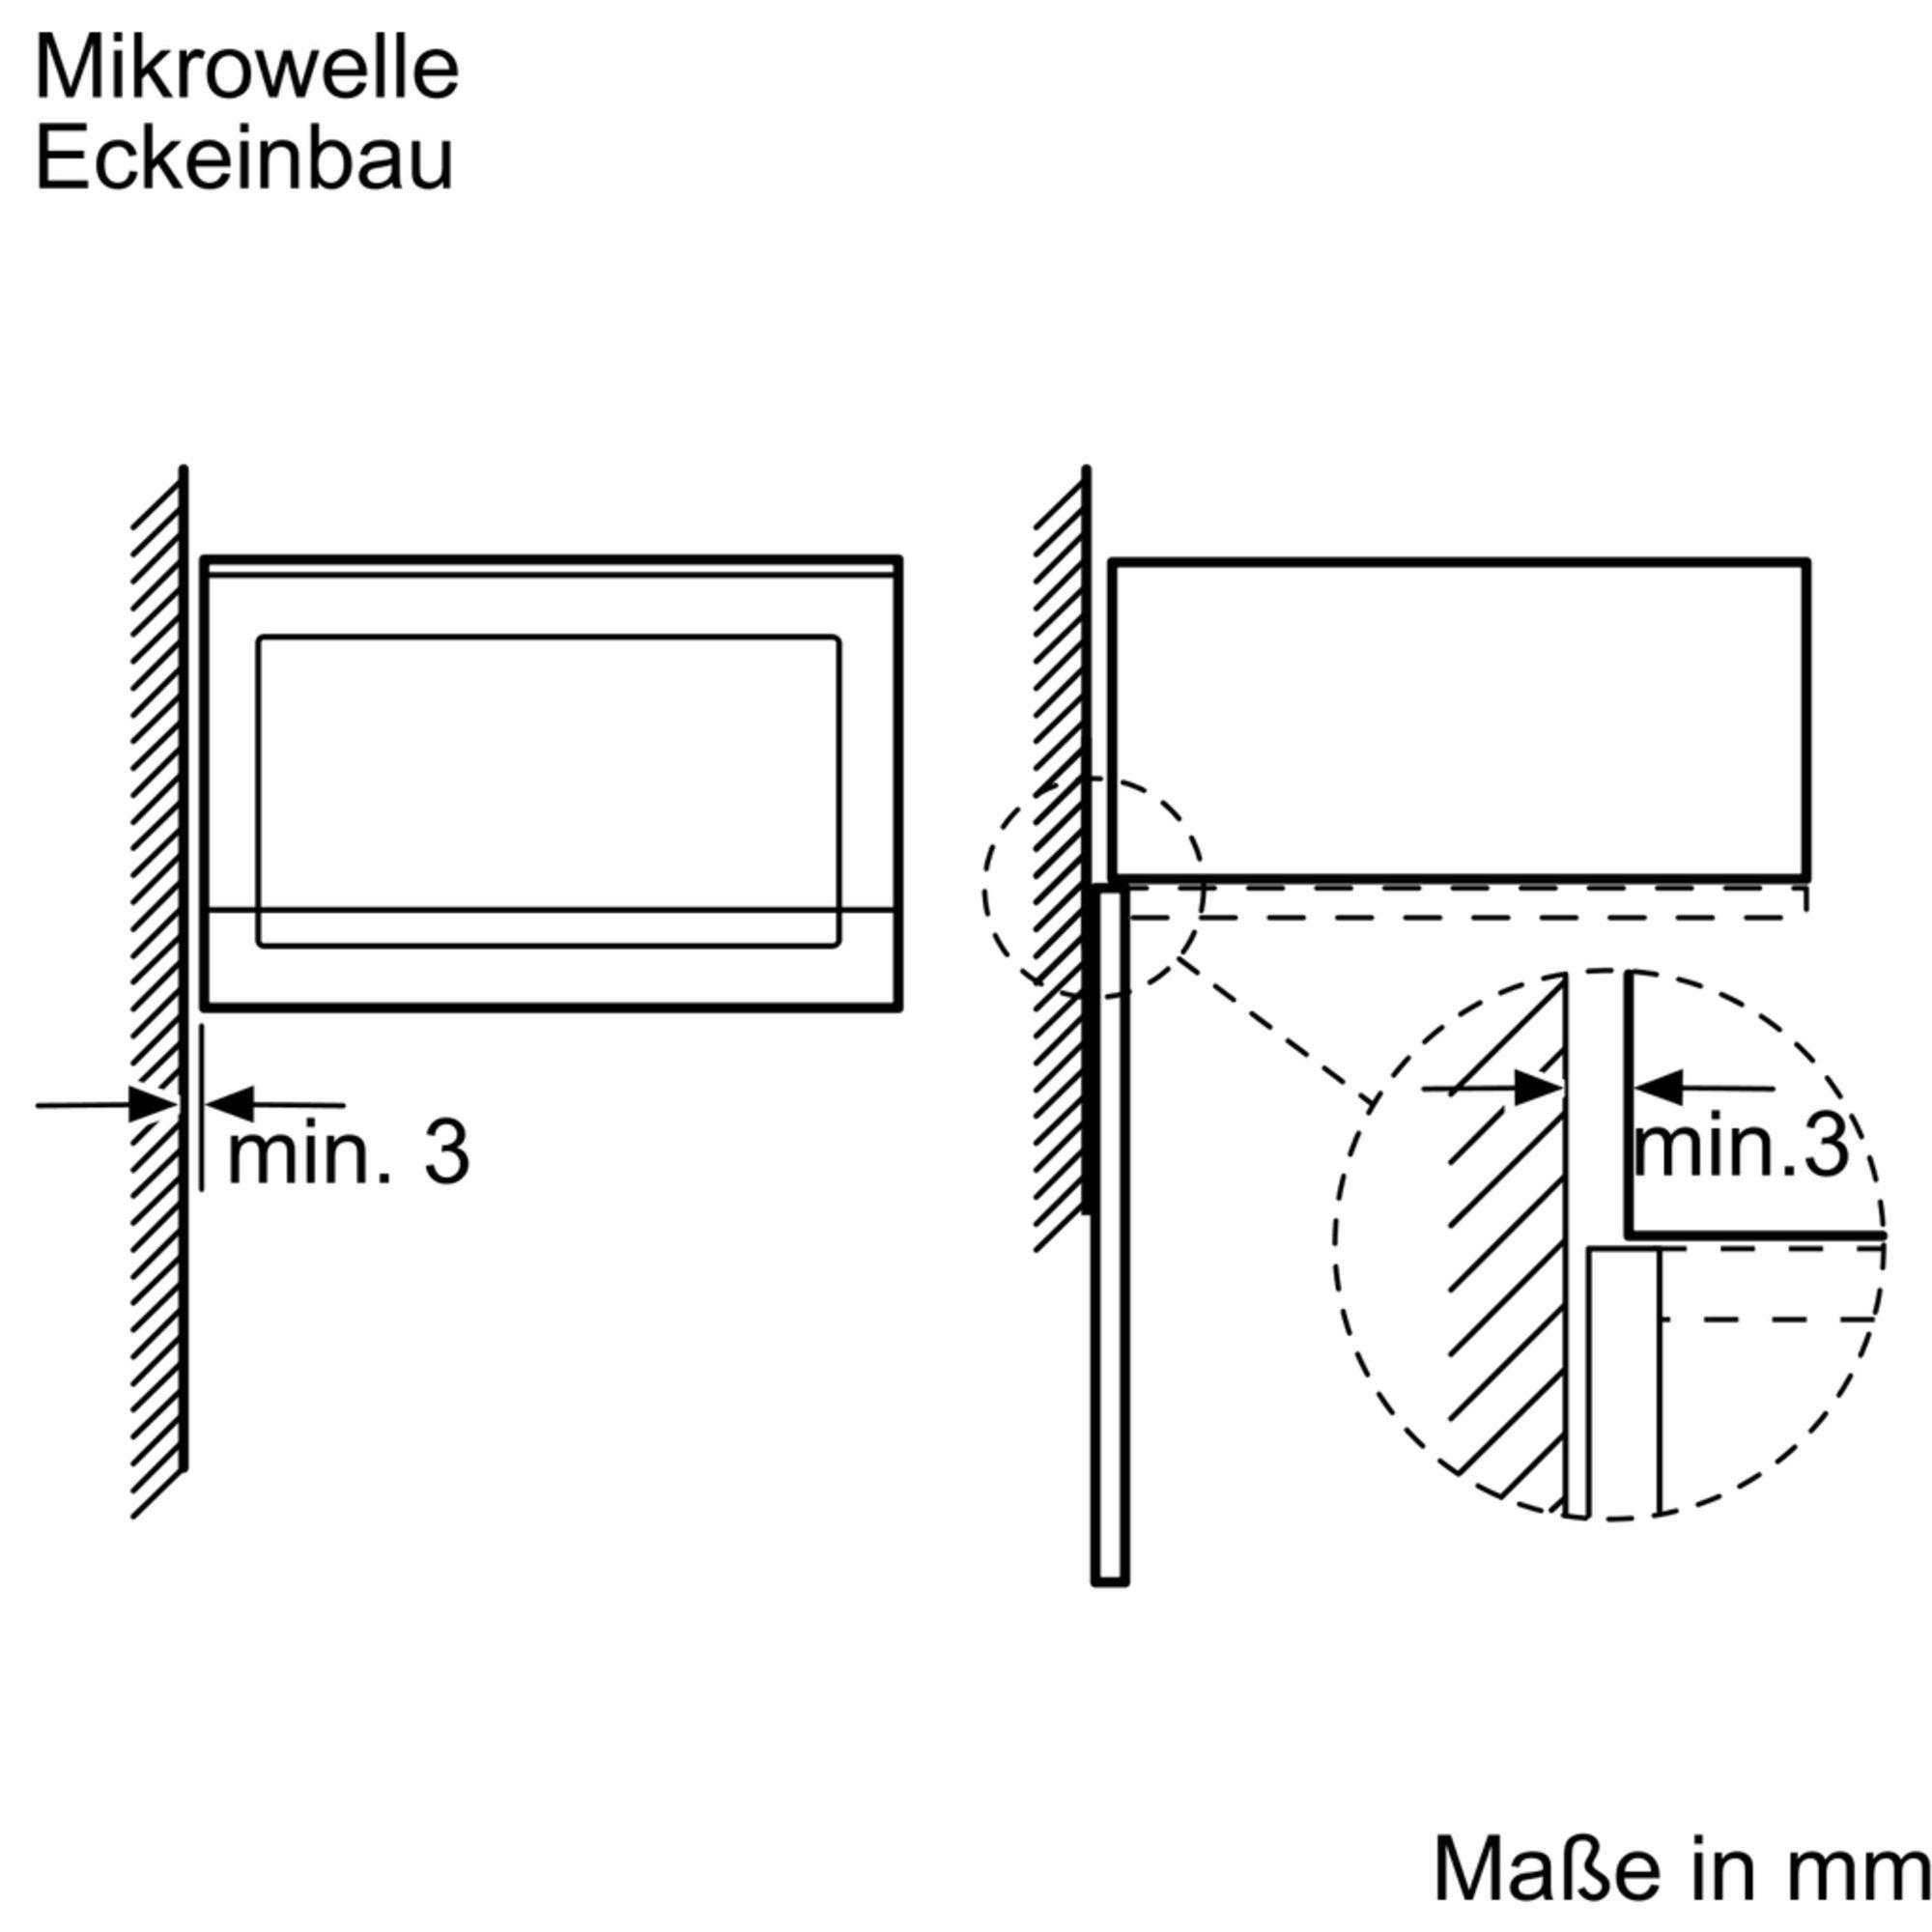 Bosch BFL524MB0 Einbau-Mikrowelle Schwarz